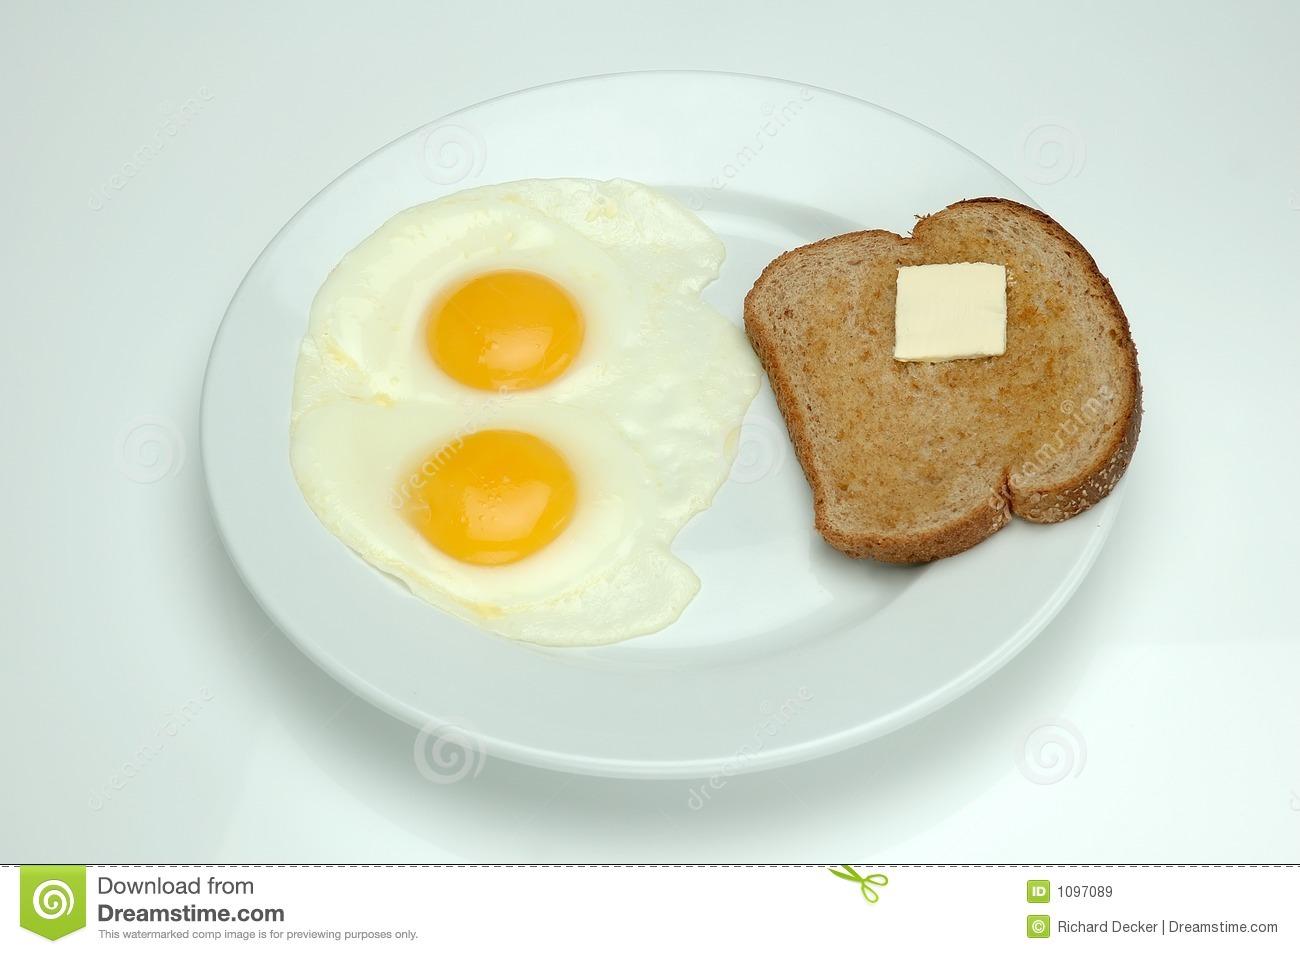 Sunny Side Up Eggs Clip Art At Clker Com Vector Clip Art Online.